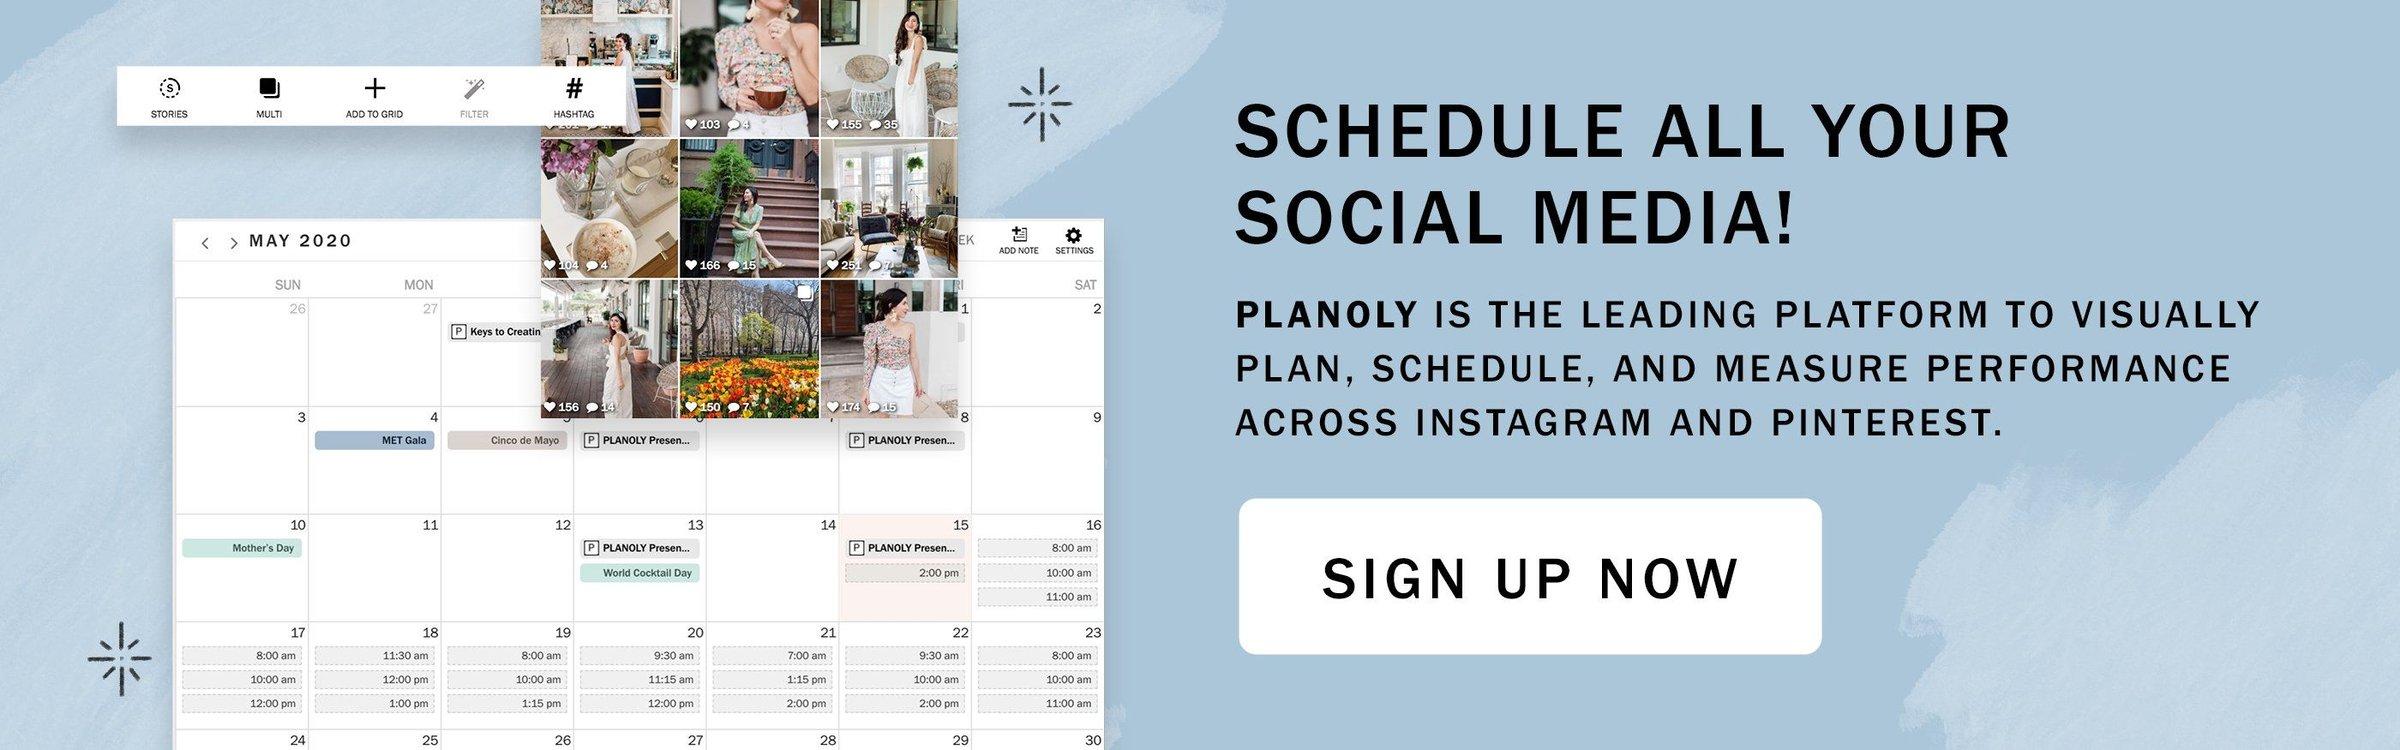 PLANOLY-Blog-Post-Social-Media-Stats-CTA-Image